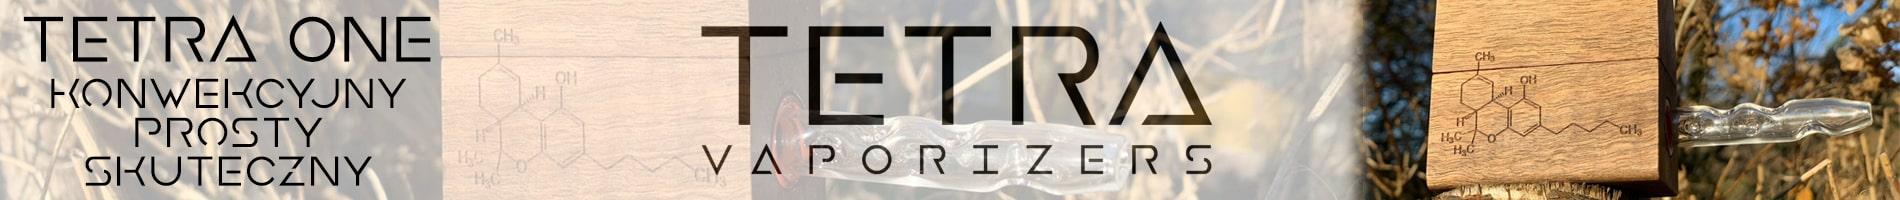 Tetra One